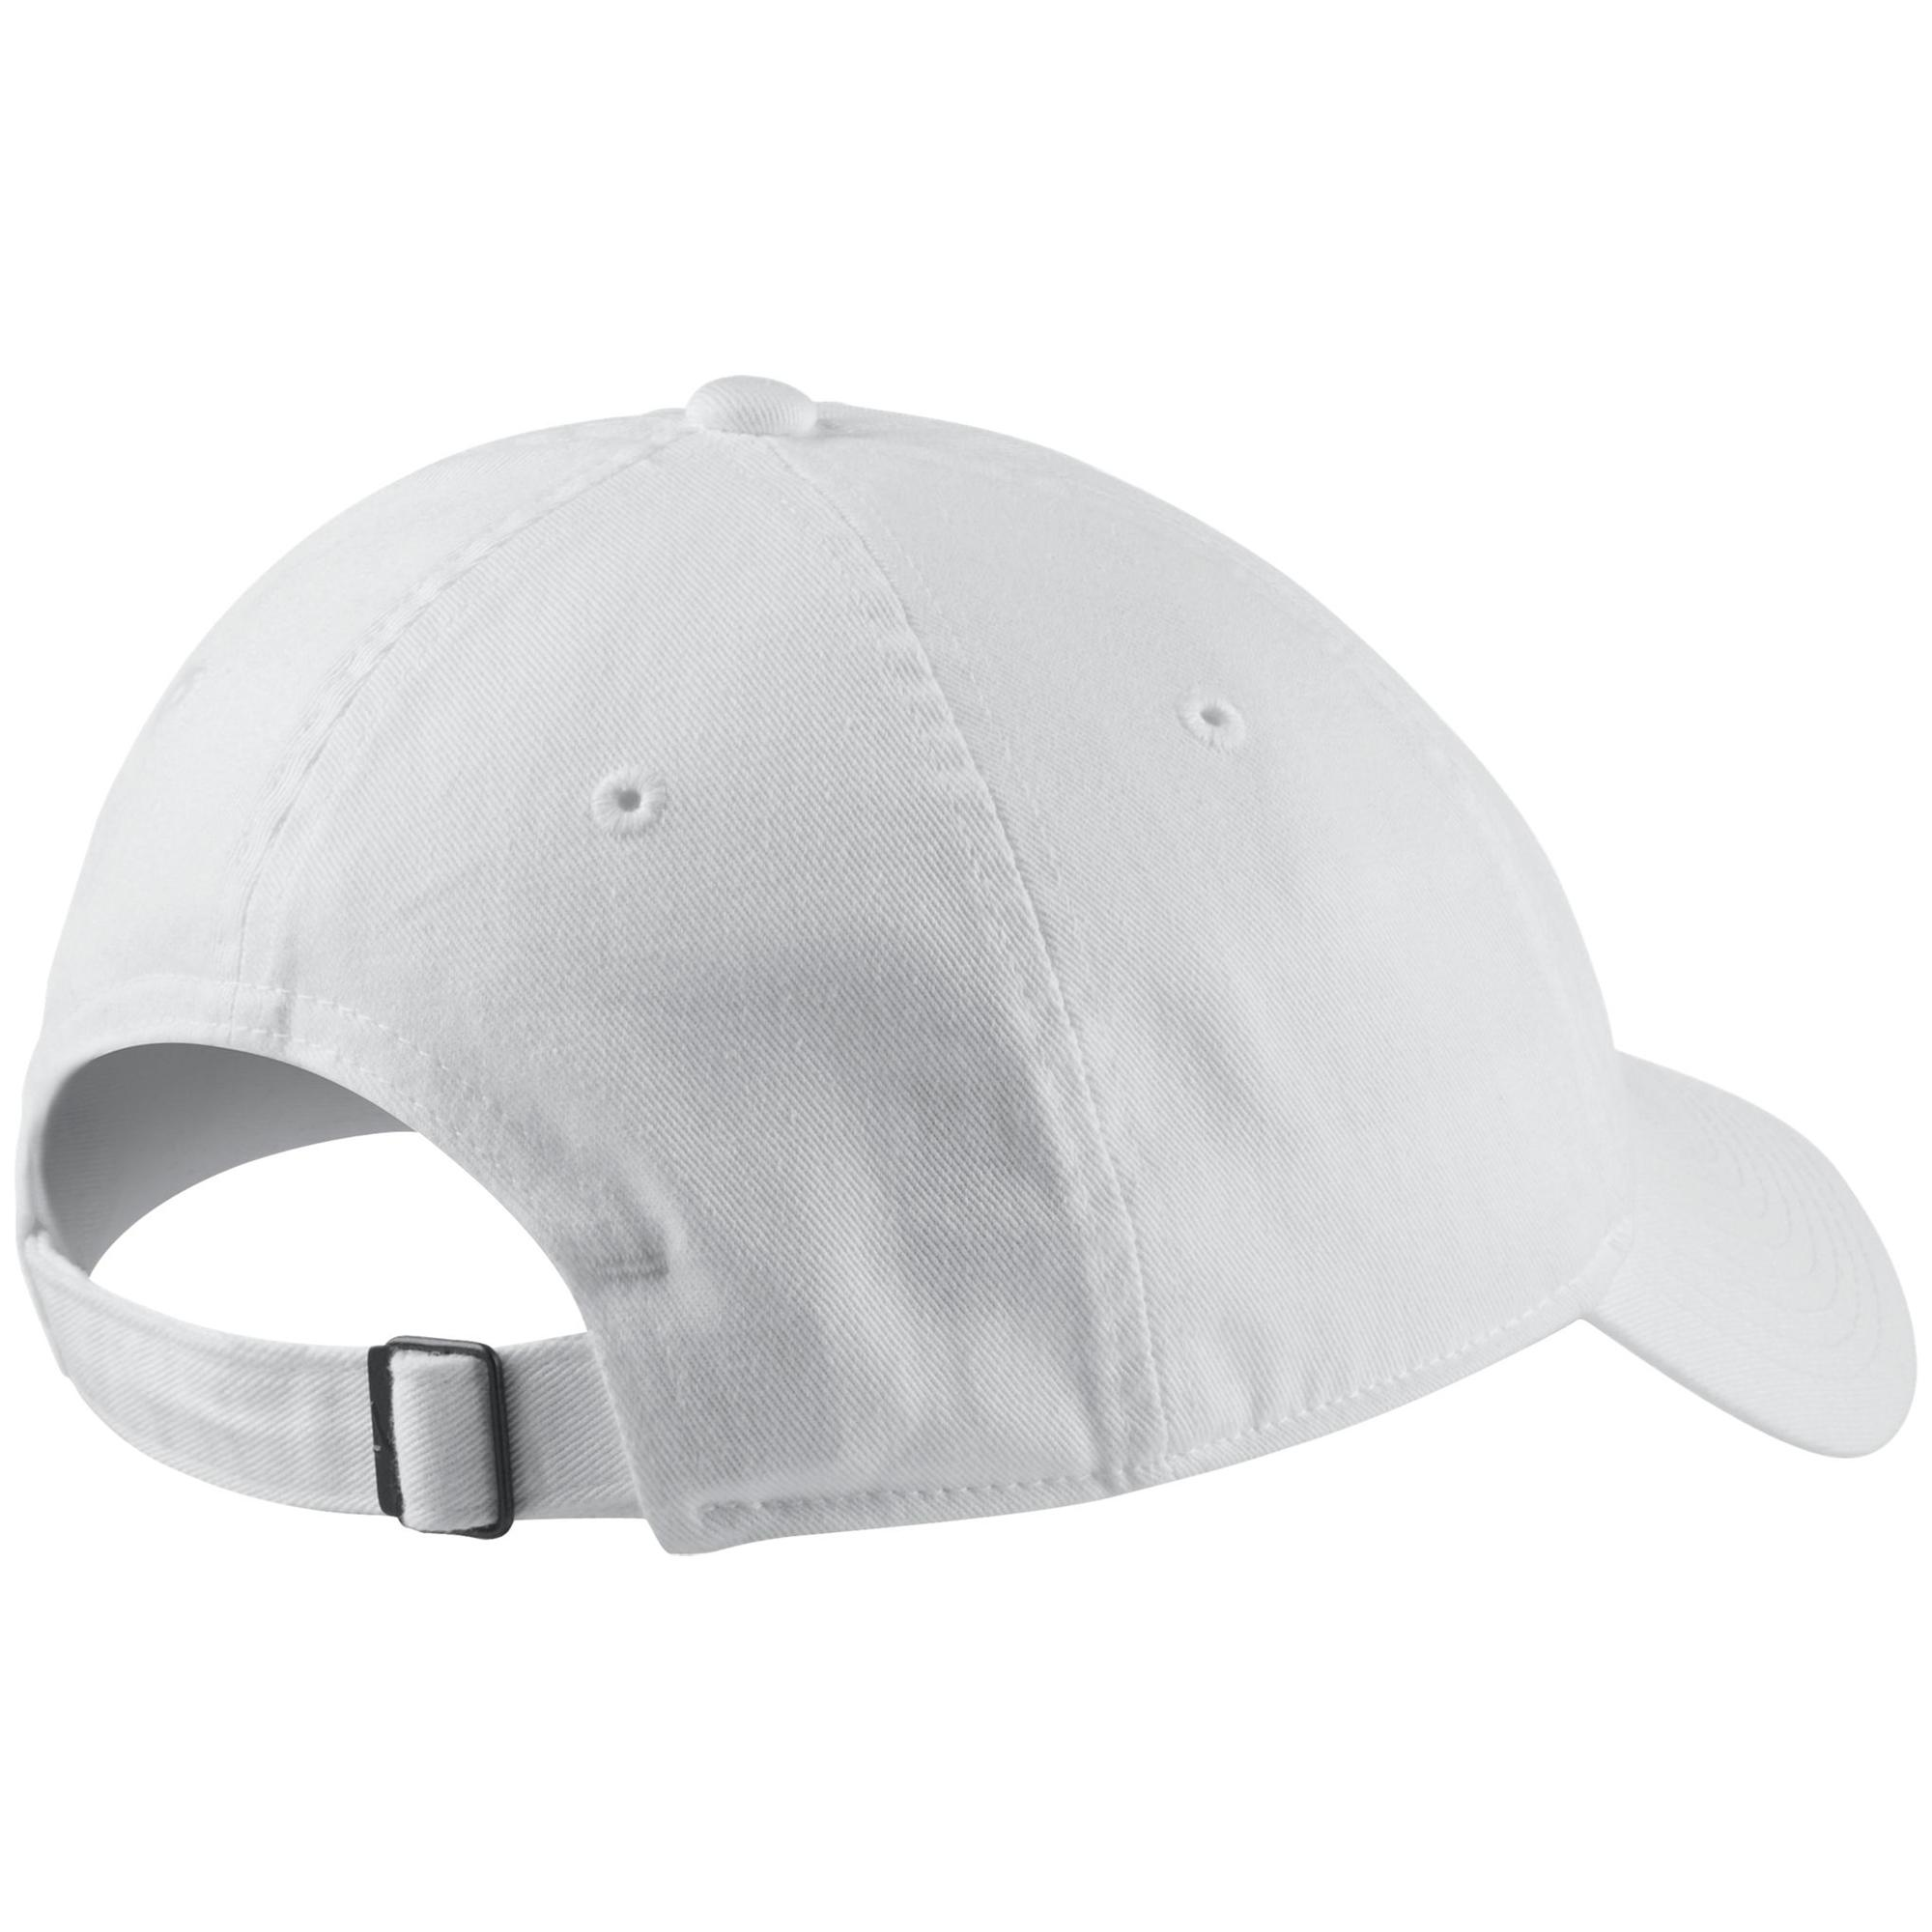 Nike Womens Futura H86 Adjustable Cap - White - Tennisnuts.com 0595c4420c2d